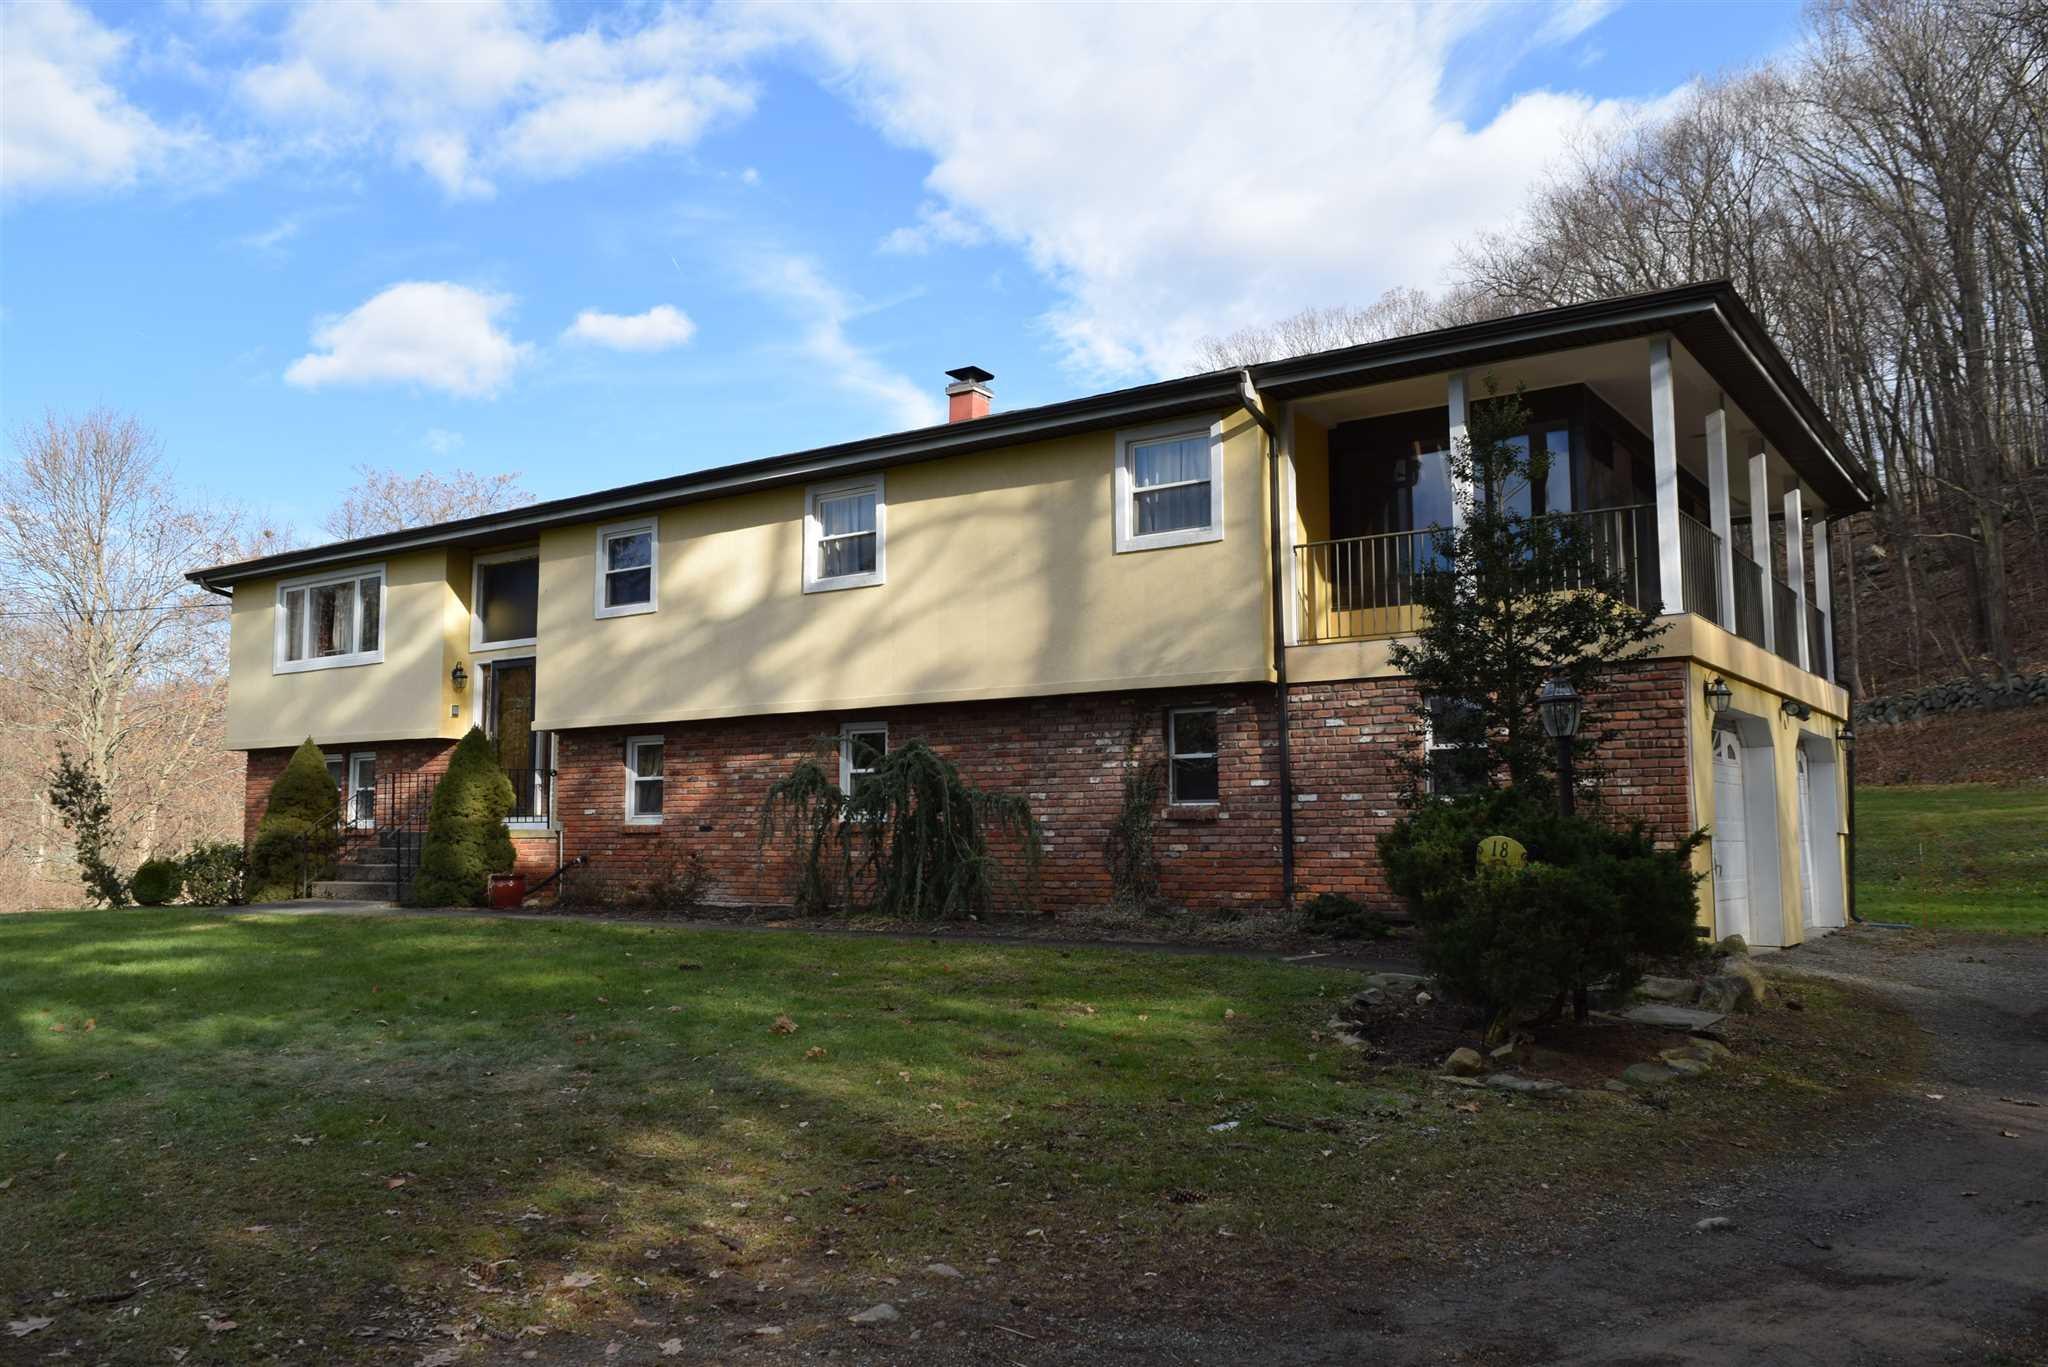 Single Family Home for Sale at 18 ASHLEY LANE 18 ASHLEY LANE Philipstown, New York 10516 United States